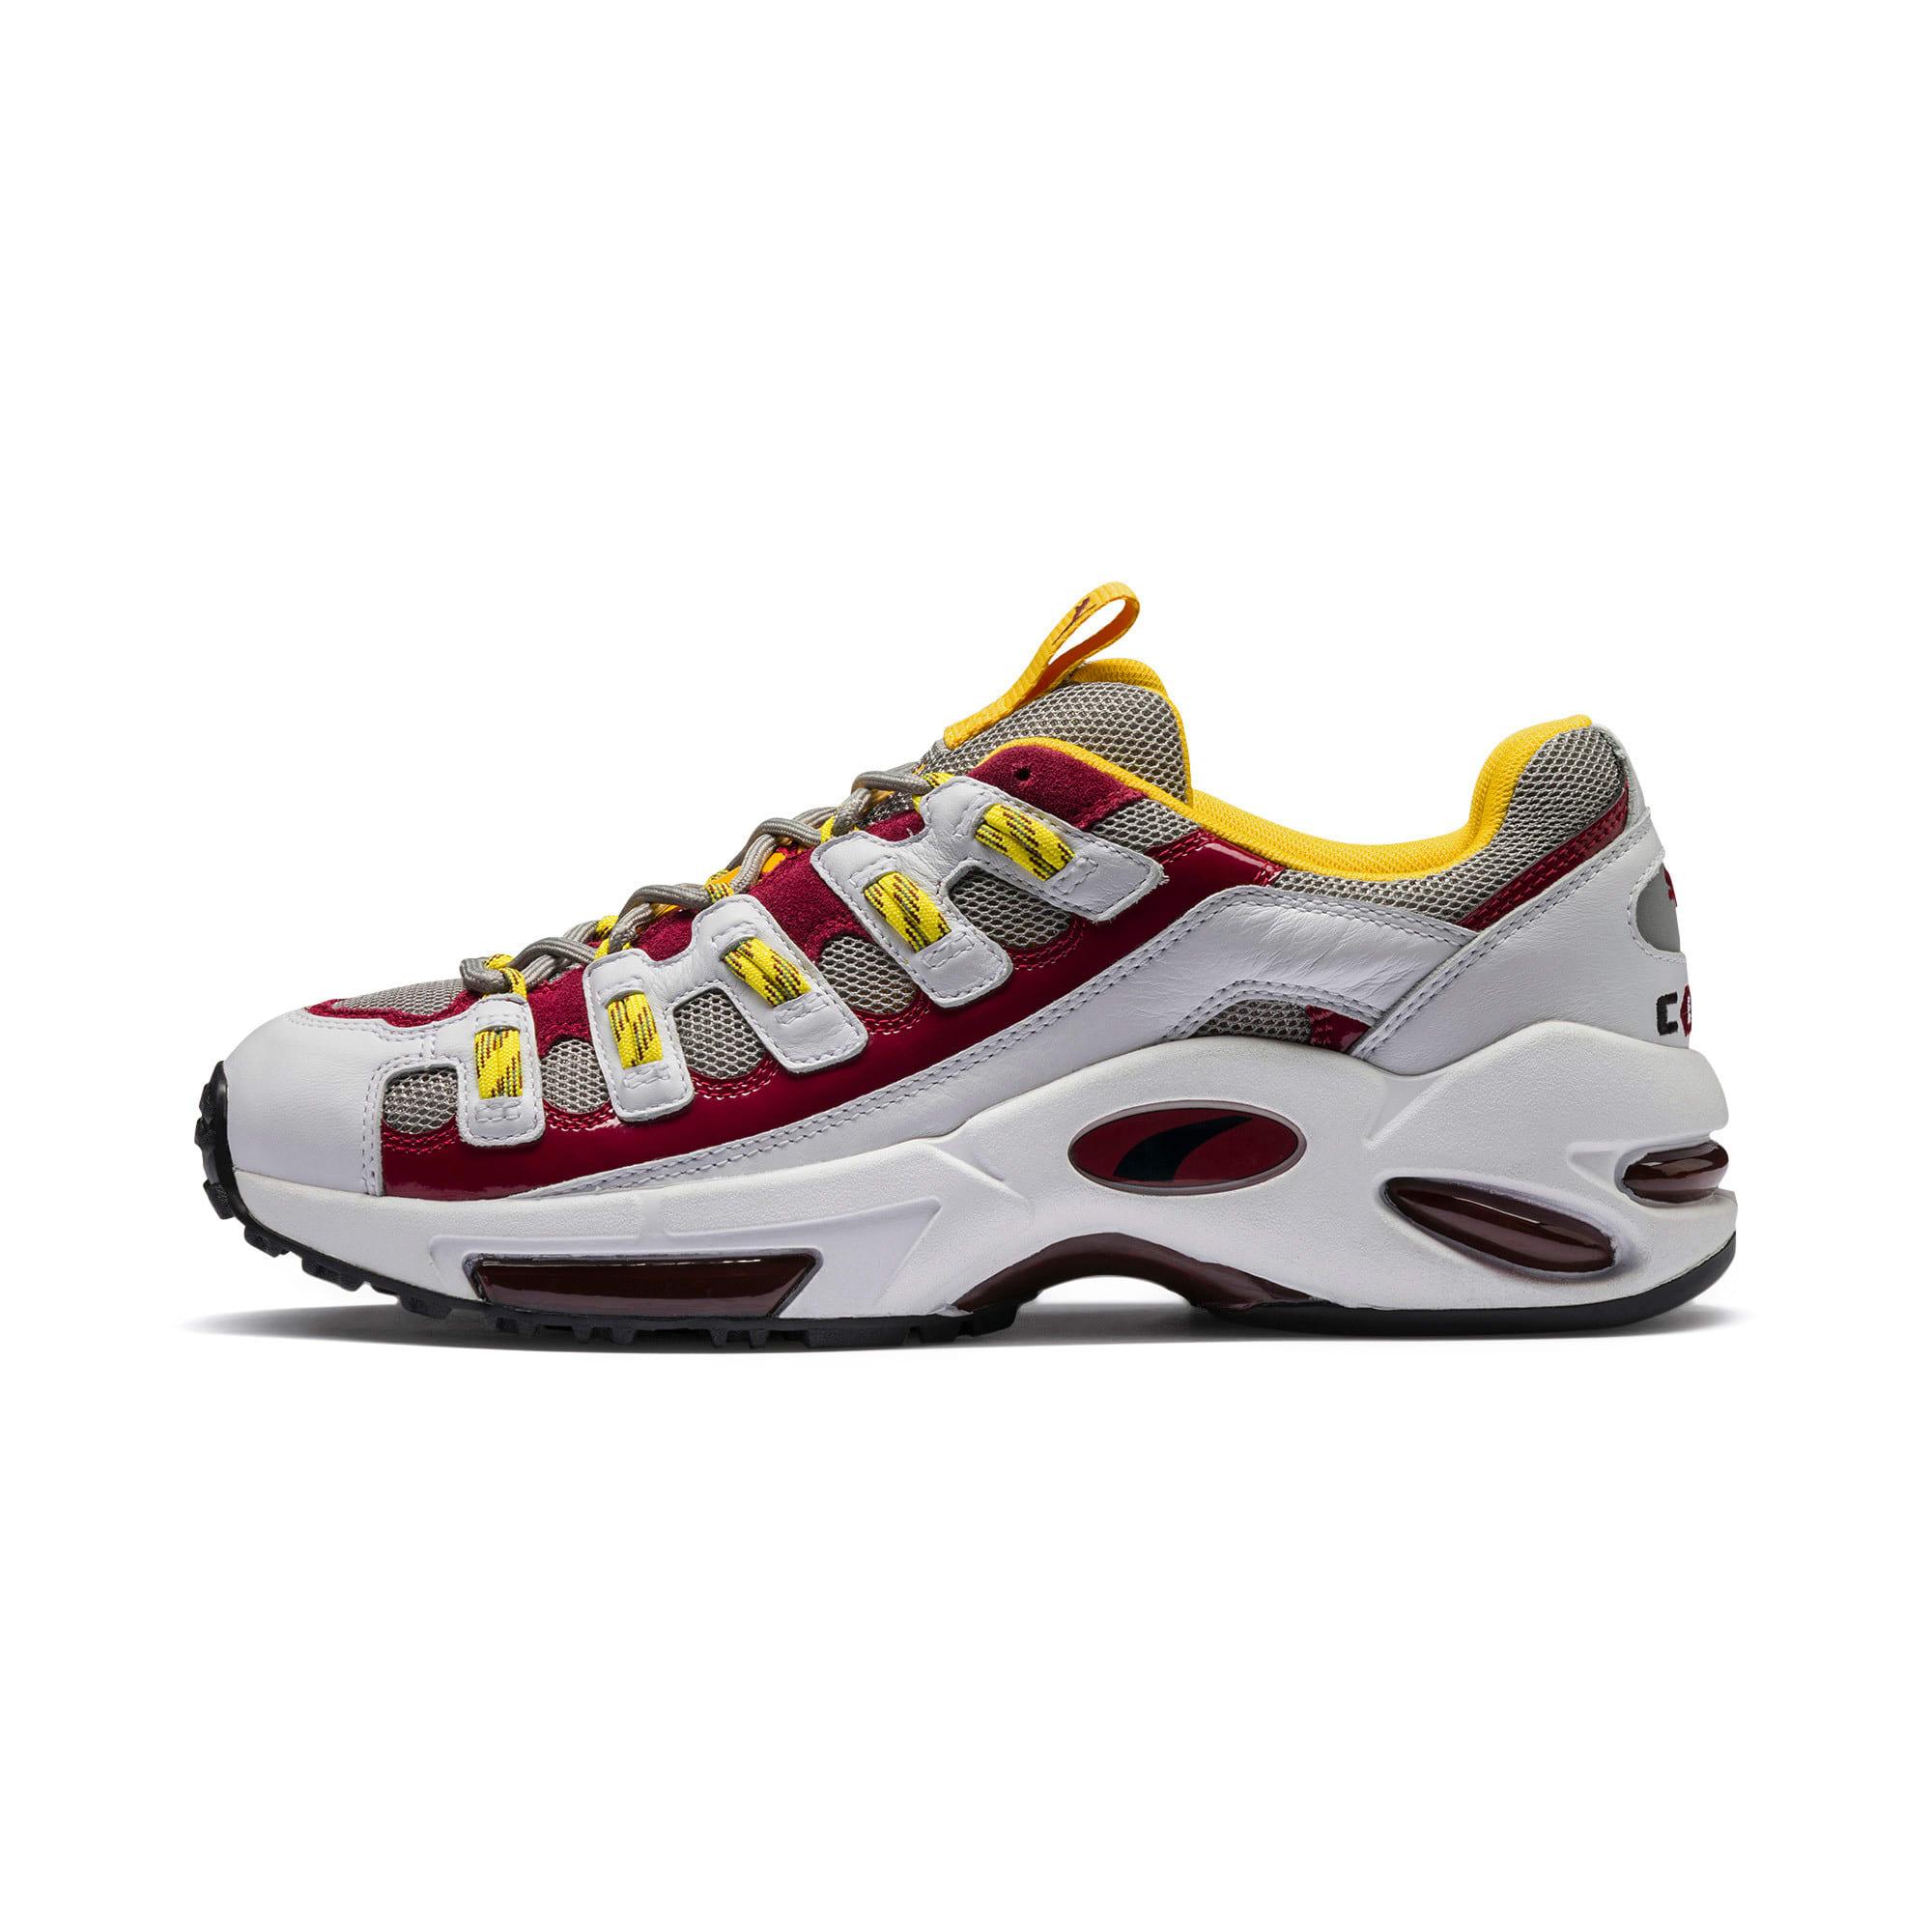 Thumbnail 1 of CELL Endura Patent 98 Men's Sneakers, Limestone-Cordovan, medium